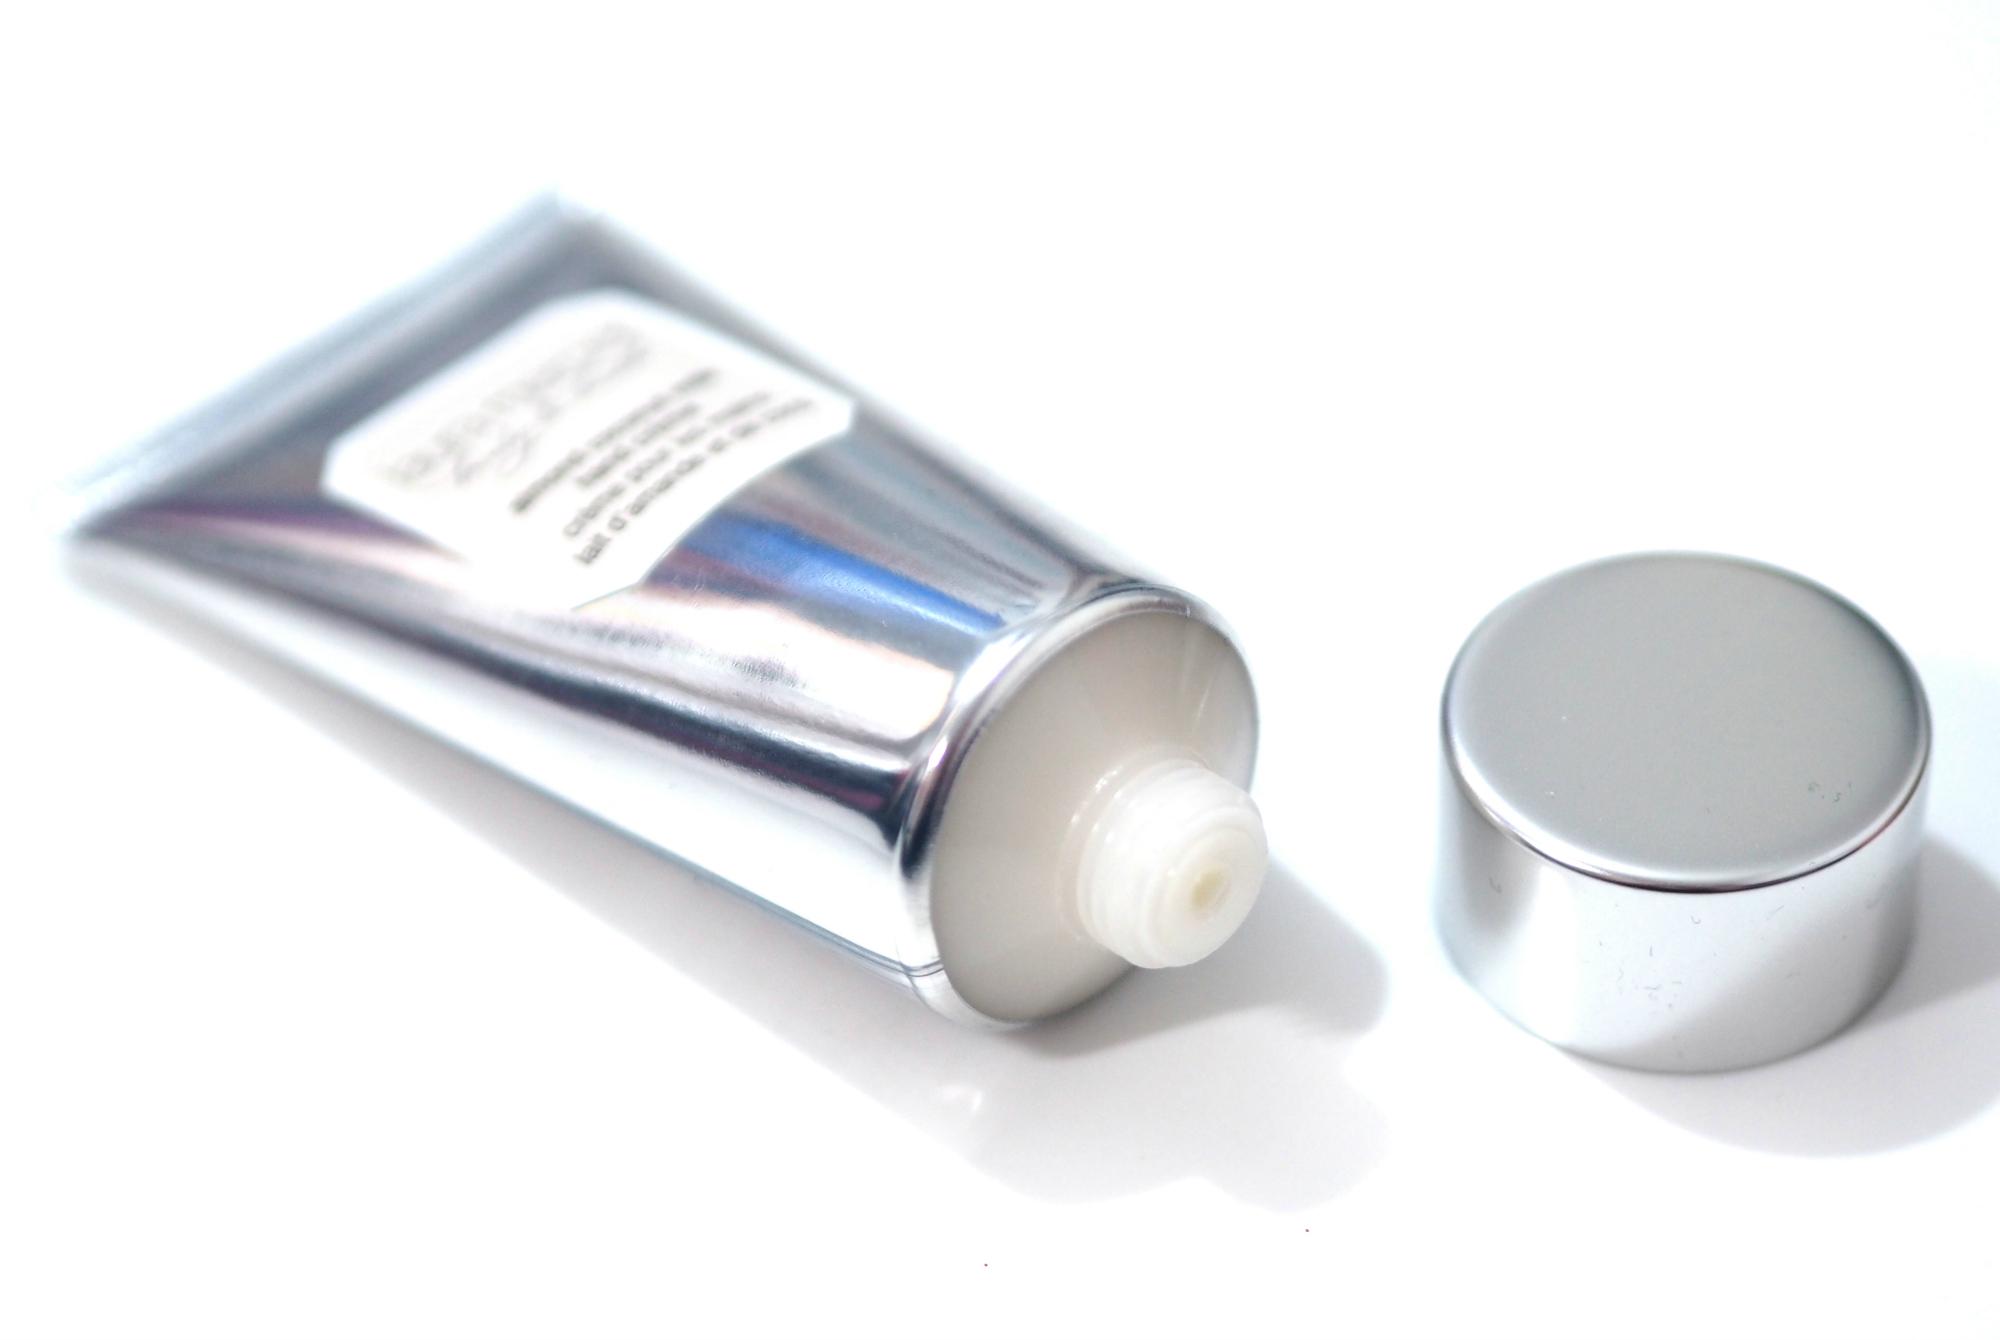 Laura Mercier Almond Coconut Milk Hand Crème Review